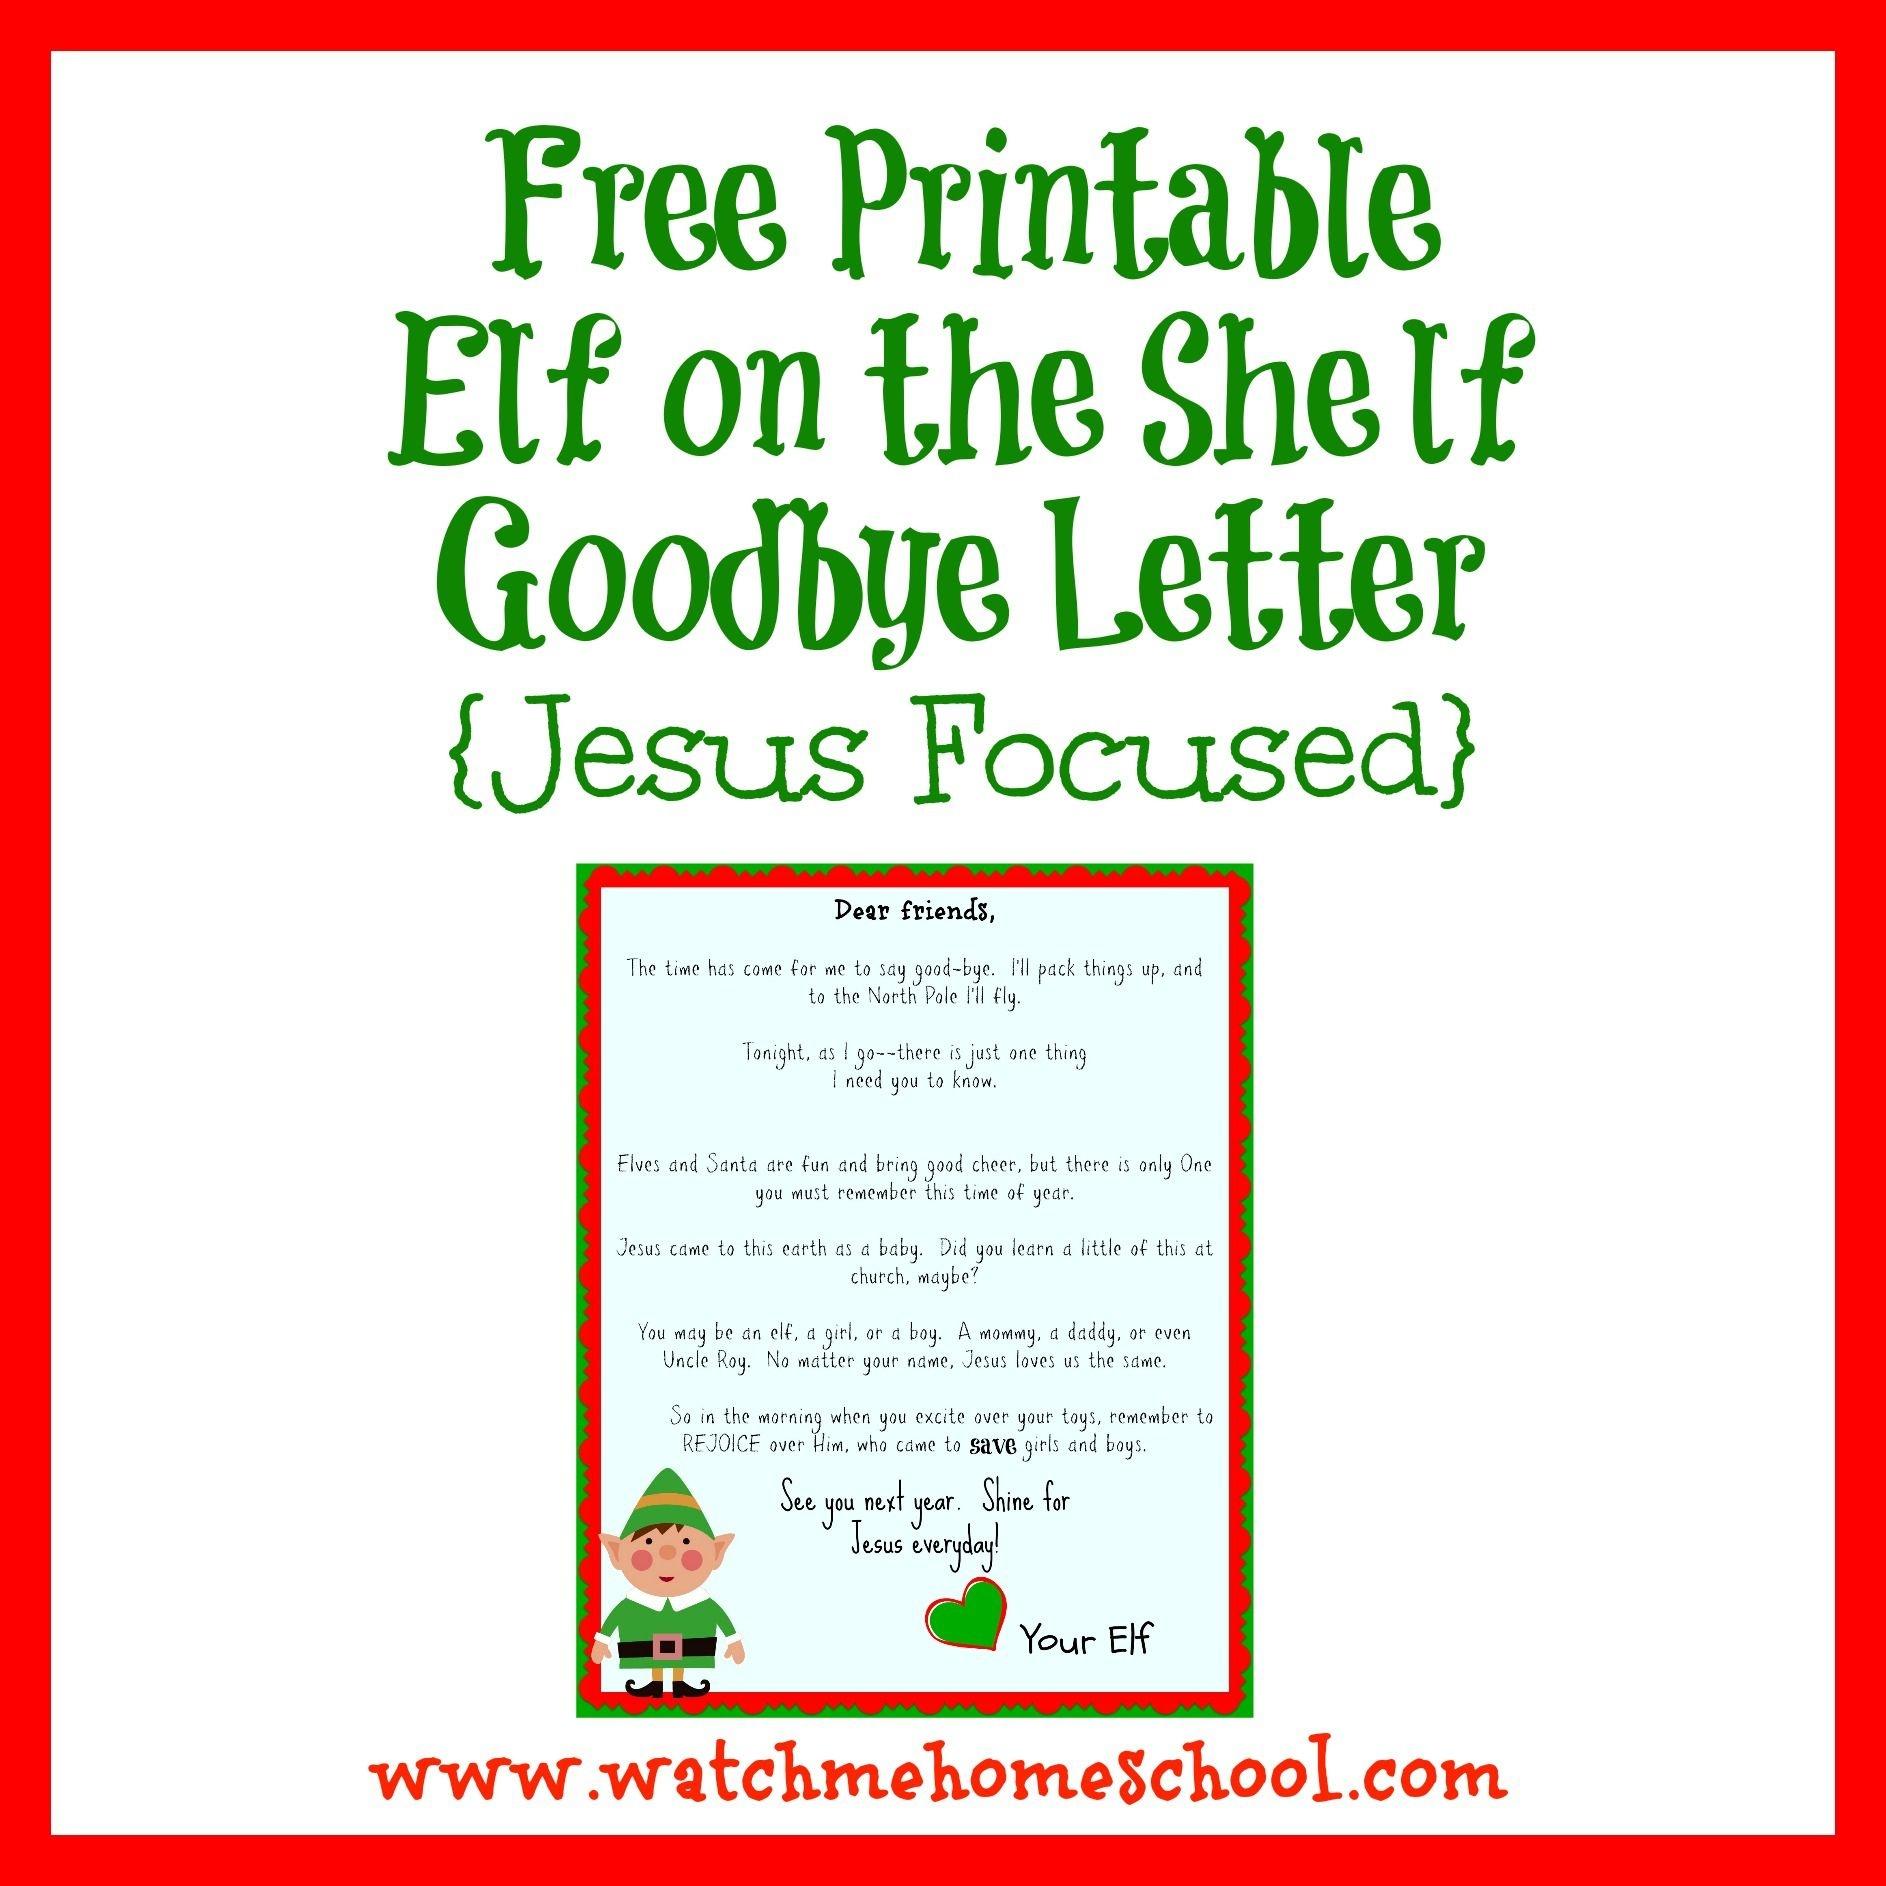 Elf On The Shelf Farewell Letter Printable   Elf On The Shelf   Elf - Elf On A Shelf Goodbye Letter Free Printable